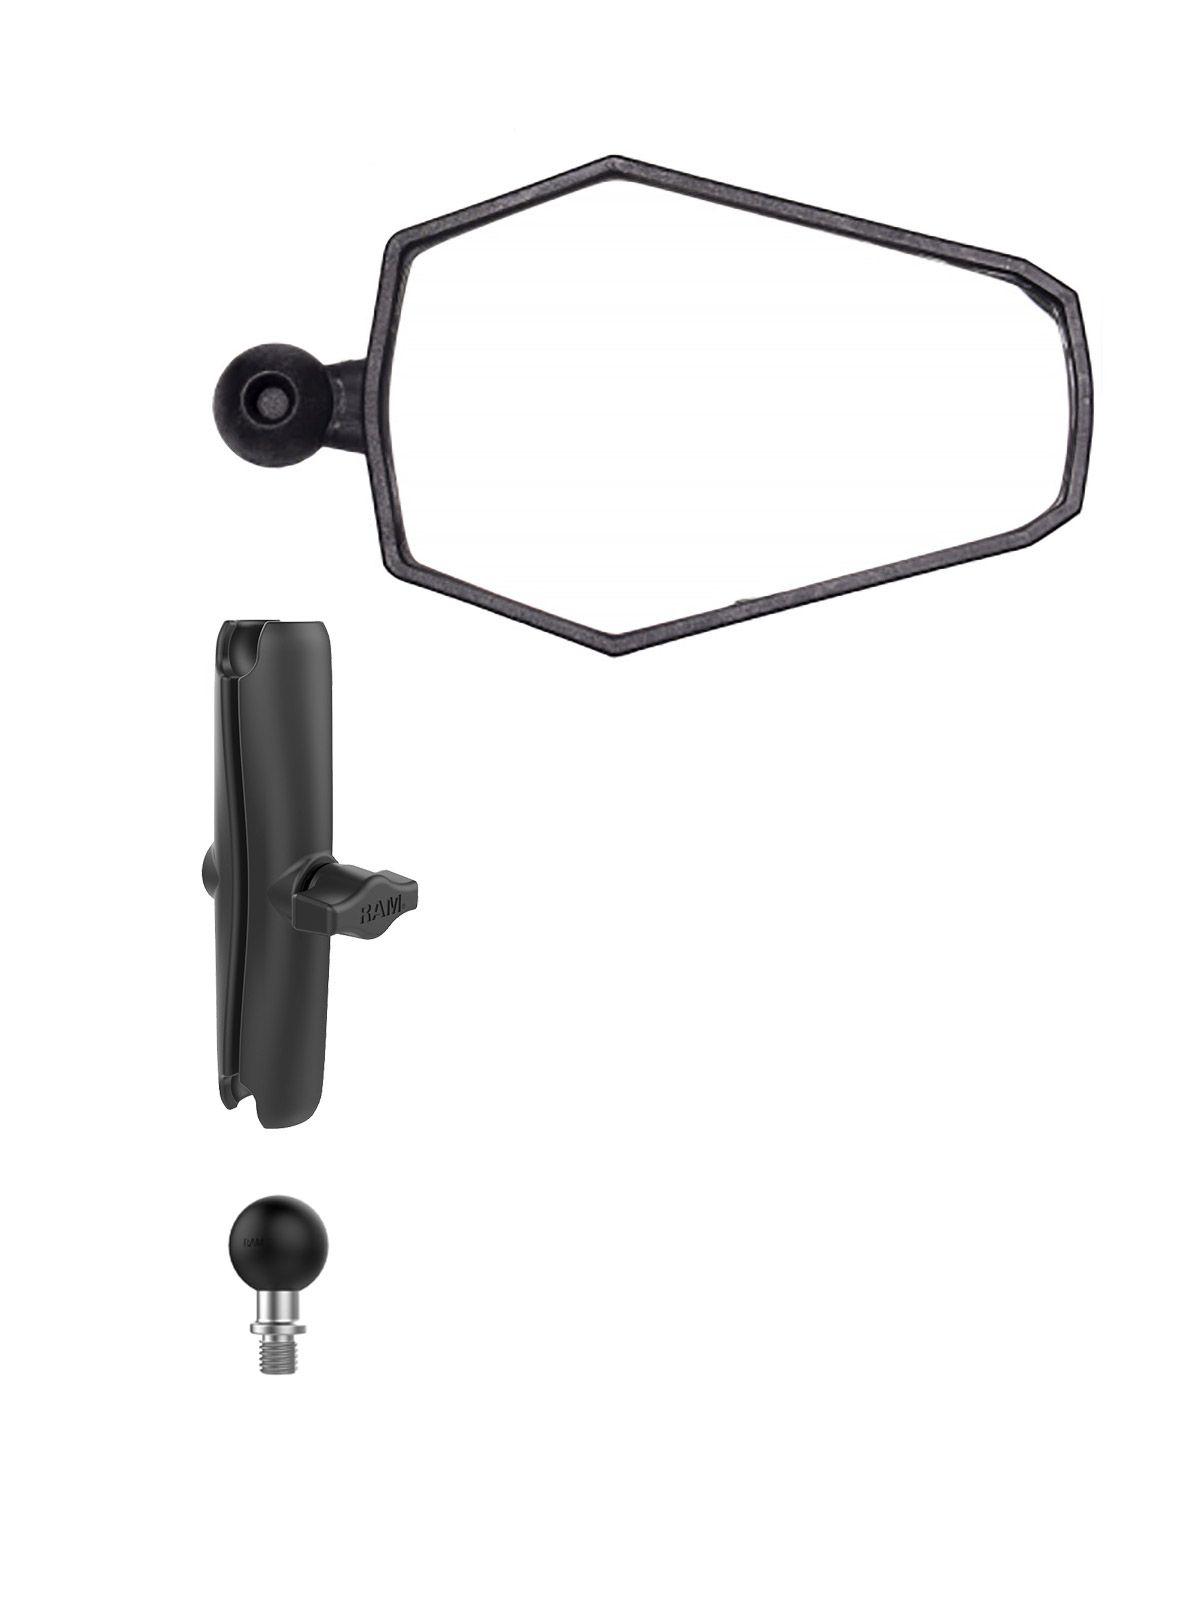 Doubletake Mirror Set - B-Kugel (1 Zoll), Adventure Mirror, langer Arm, M10 Basiskugel